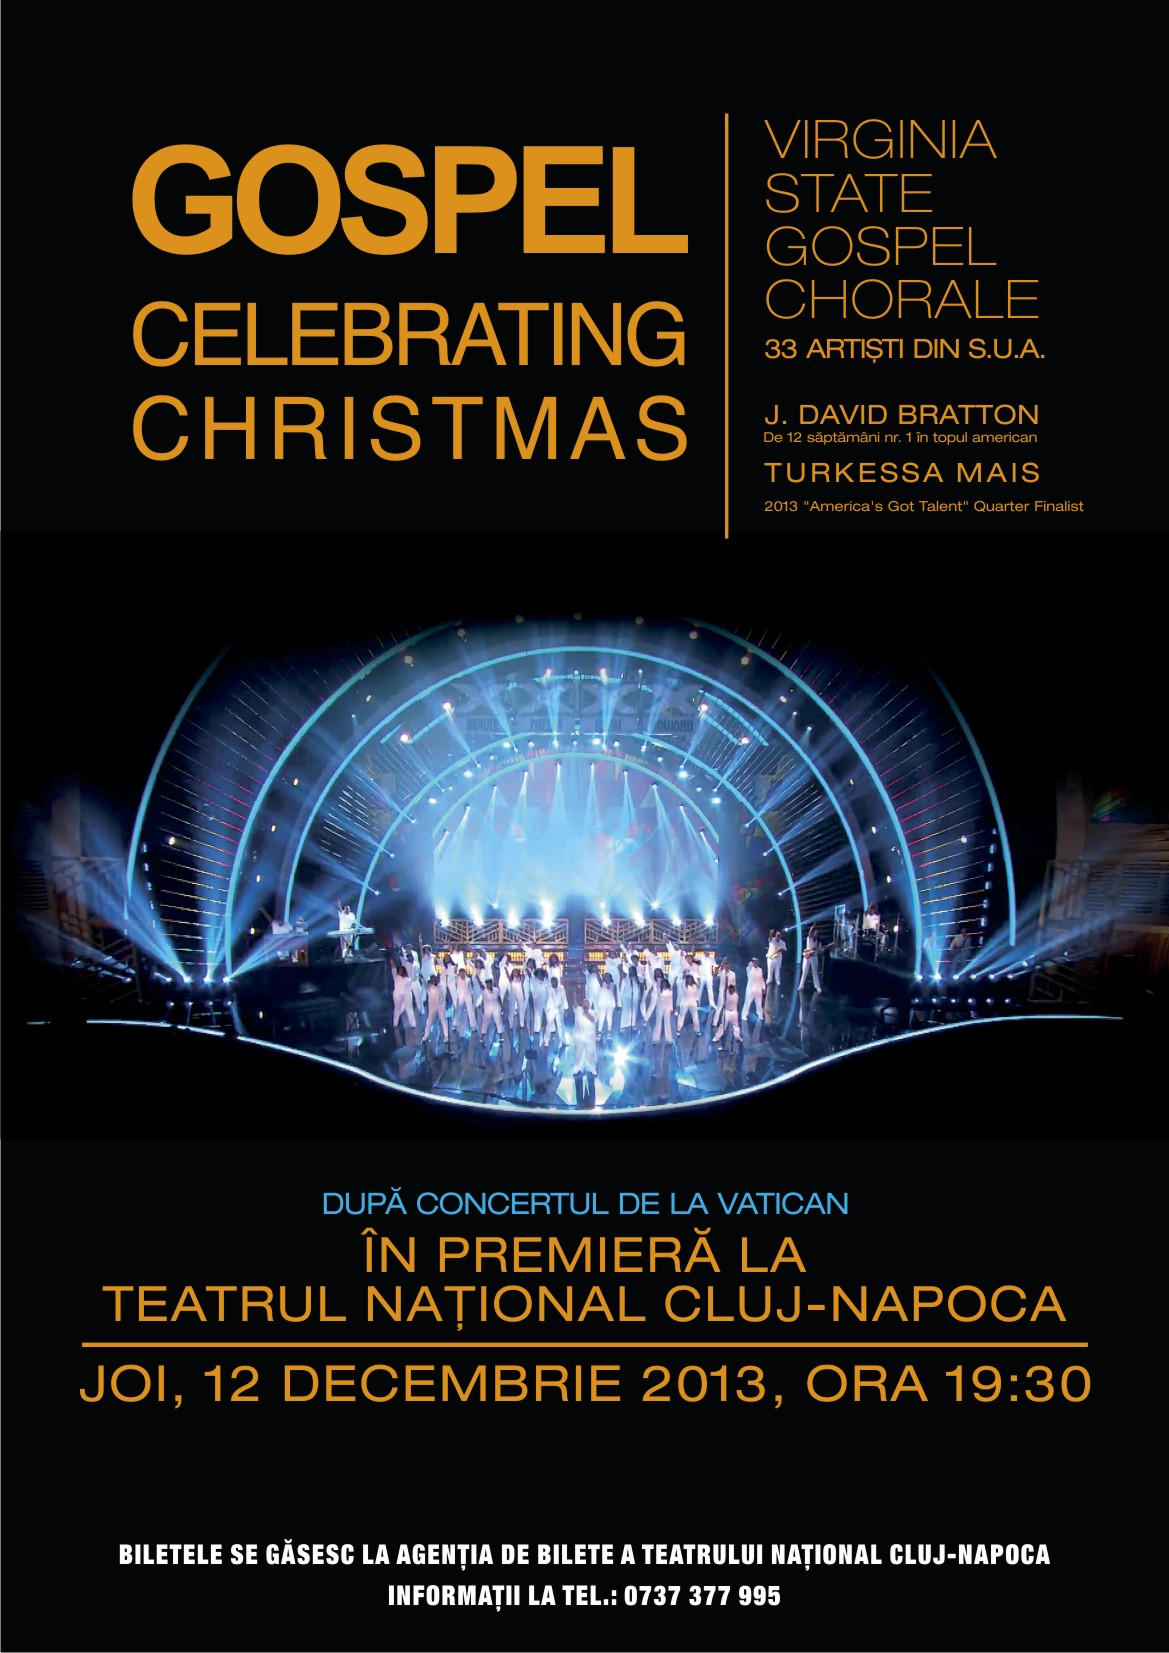 Virginia State Gospel Chorale @ Teatrul National Cluj-Napoca